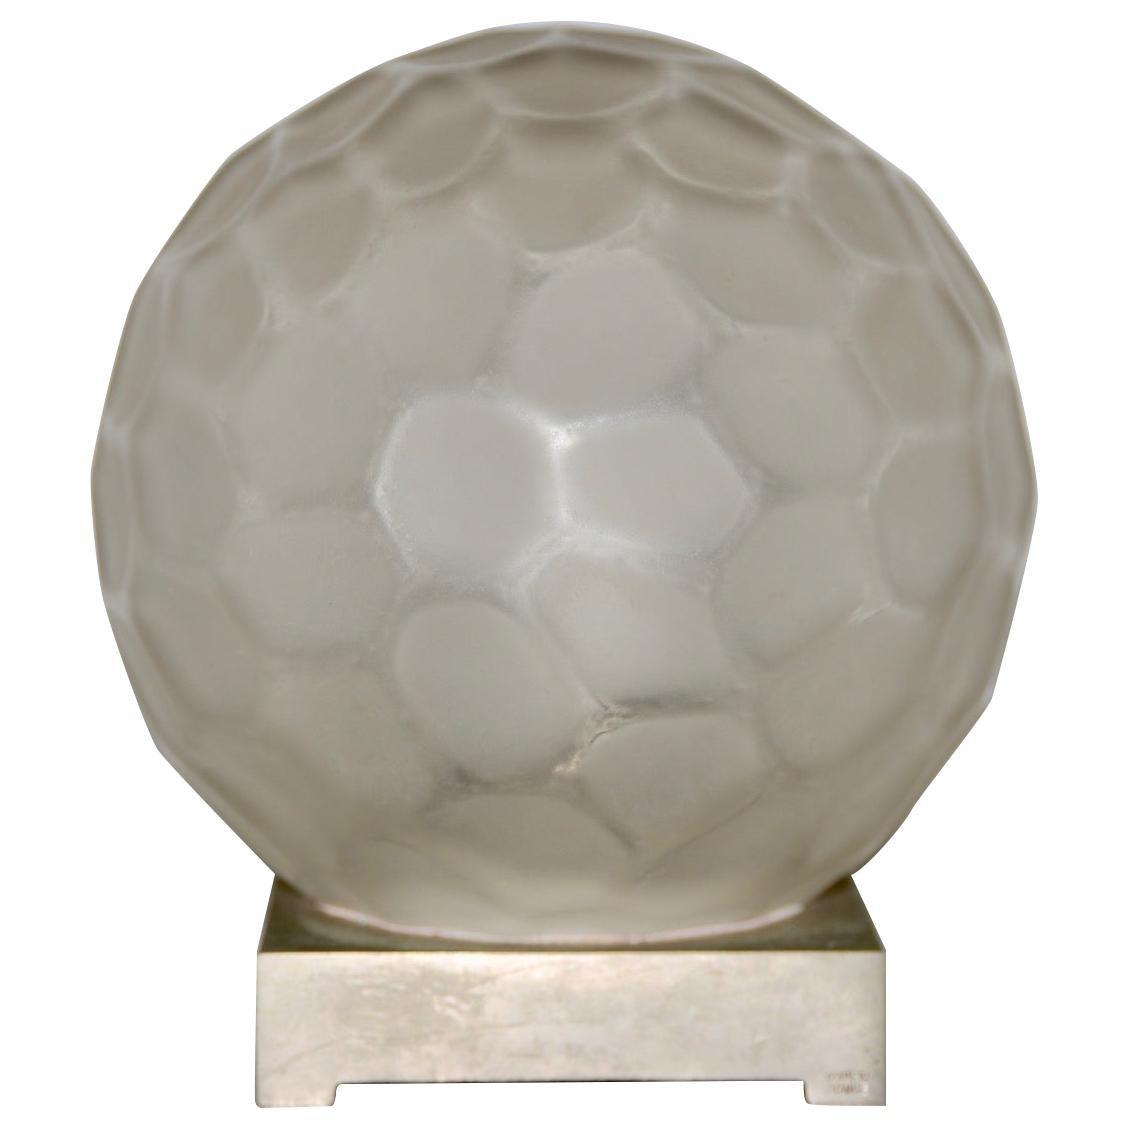 Genet & Michon 'France' Art Deco Glass Globe Table Lamp, circa 1920s